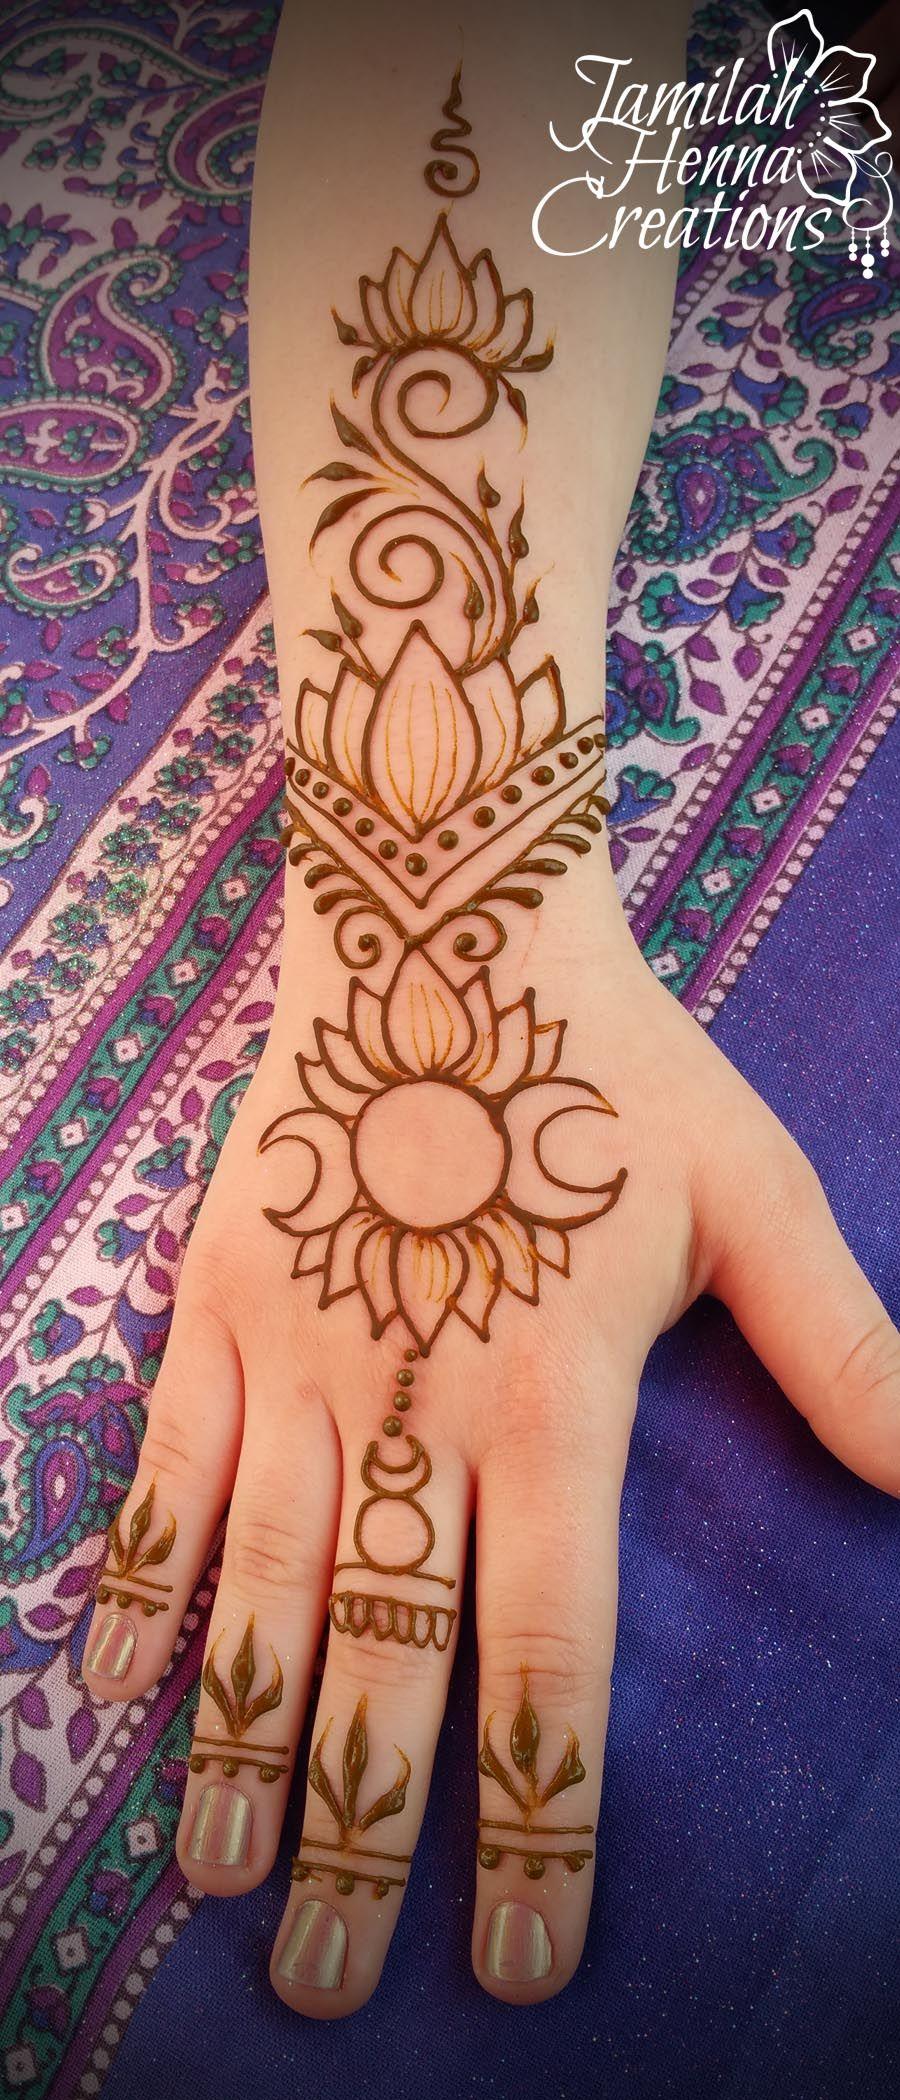 Moon Henna Lotus Www Jamilahhennacreations Com Henna Tattoo Designs Simple Simple Henna Tattoo Henna Tattoo Designs